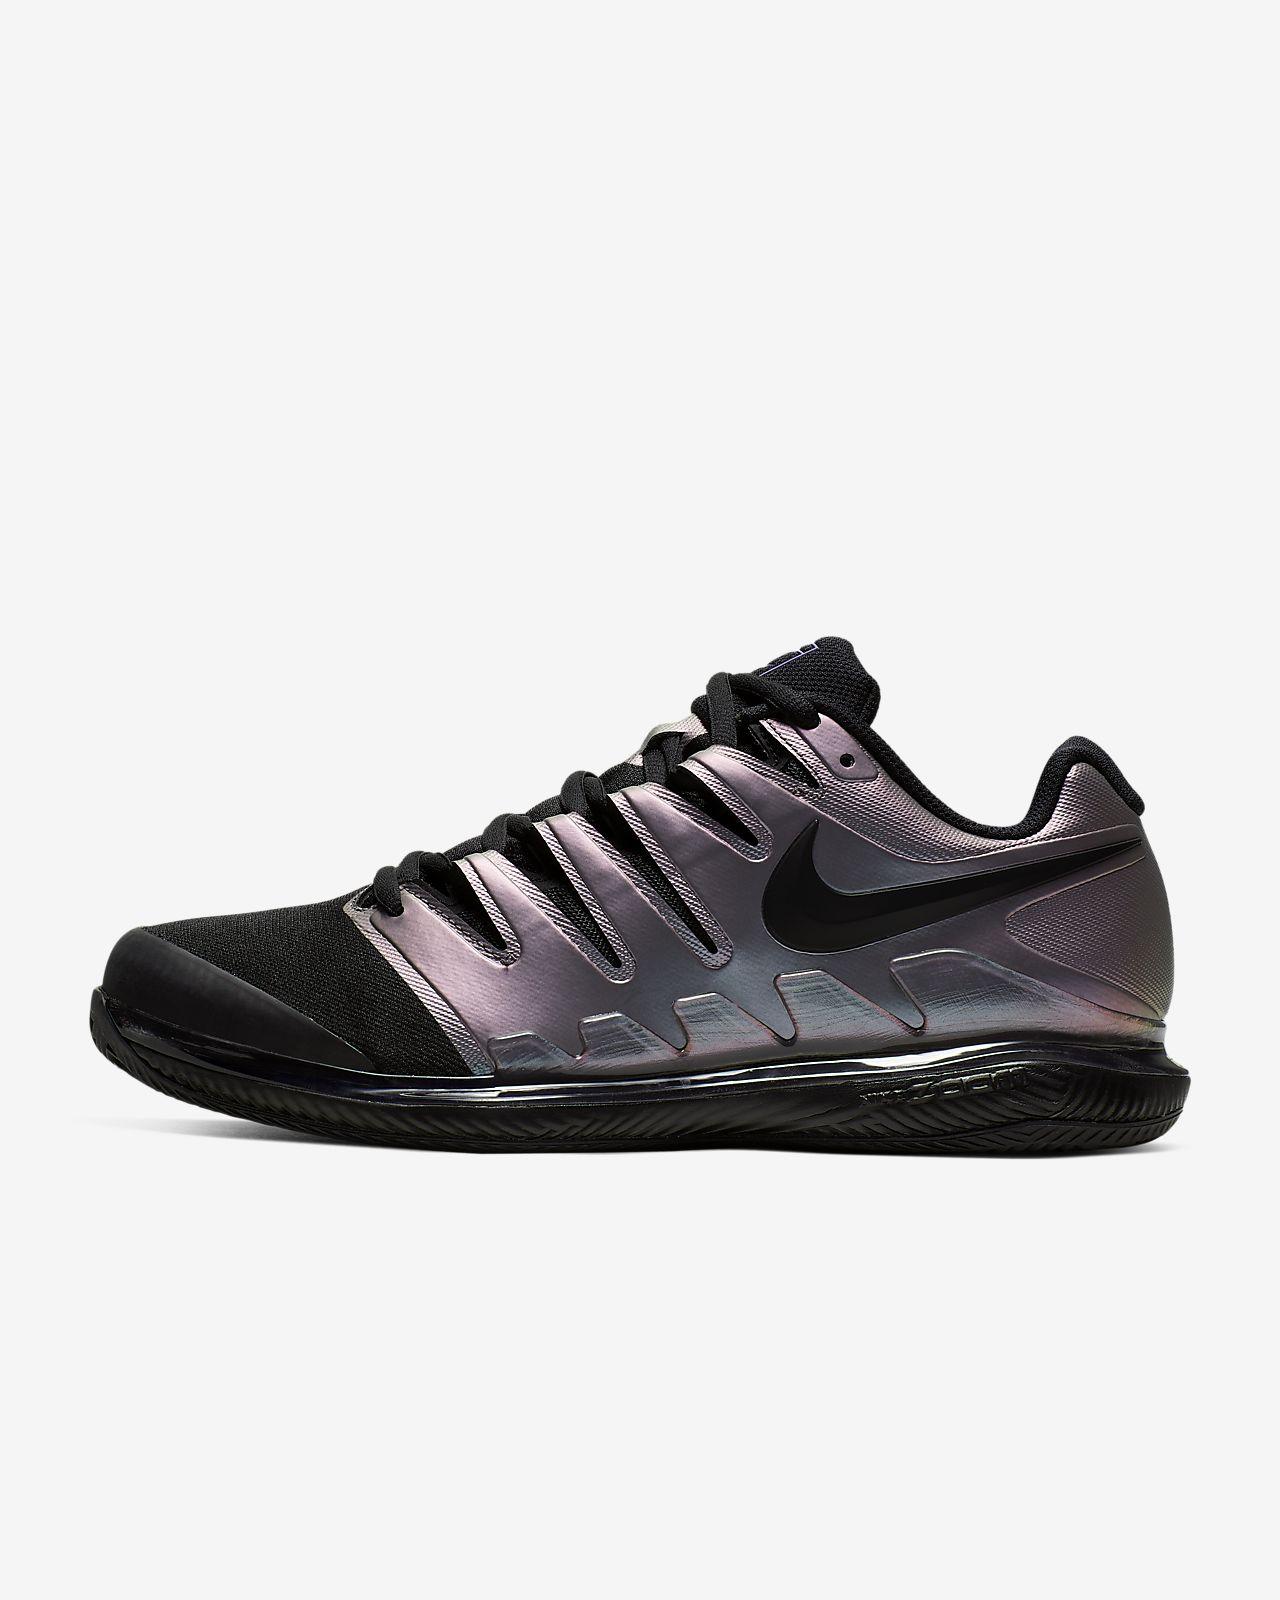 Pánská tenisová bota NikeCourt Air Zoom Vapor X na antuku